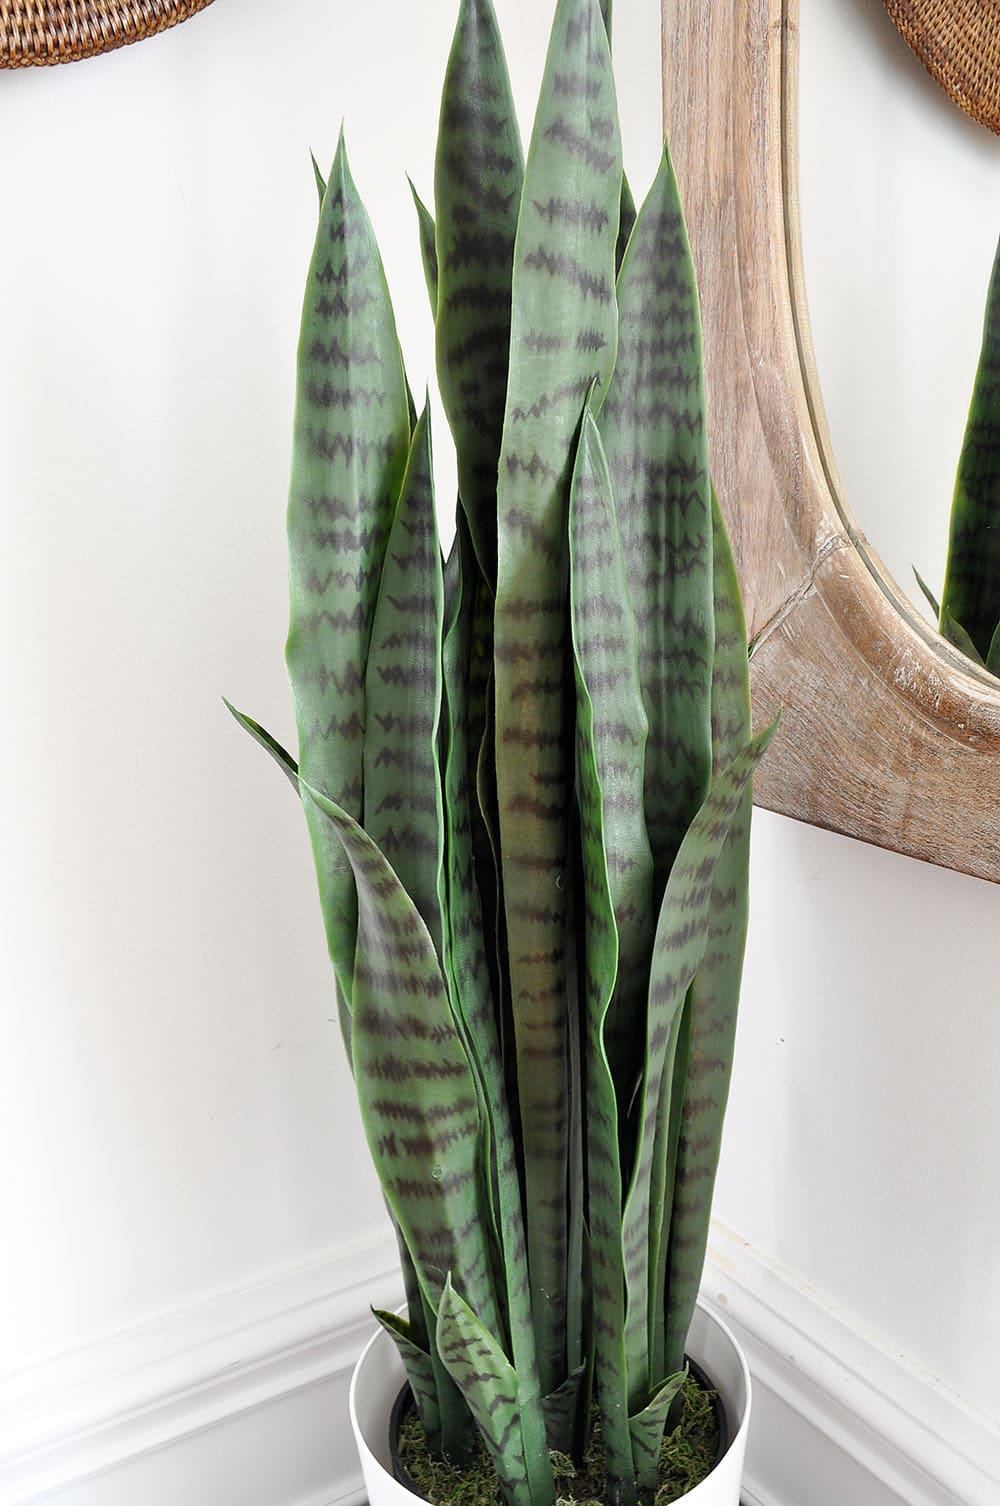 snake plant close